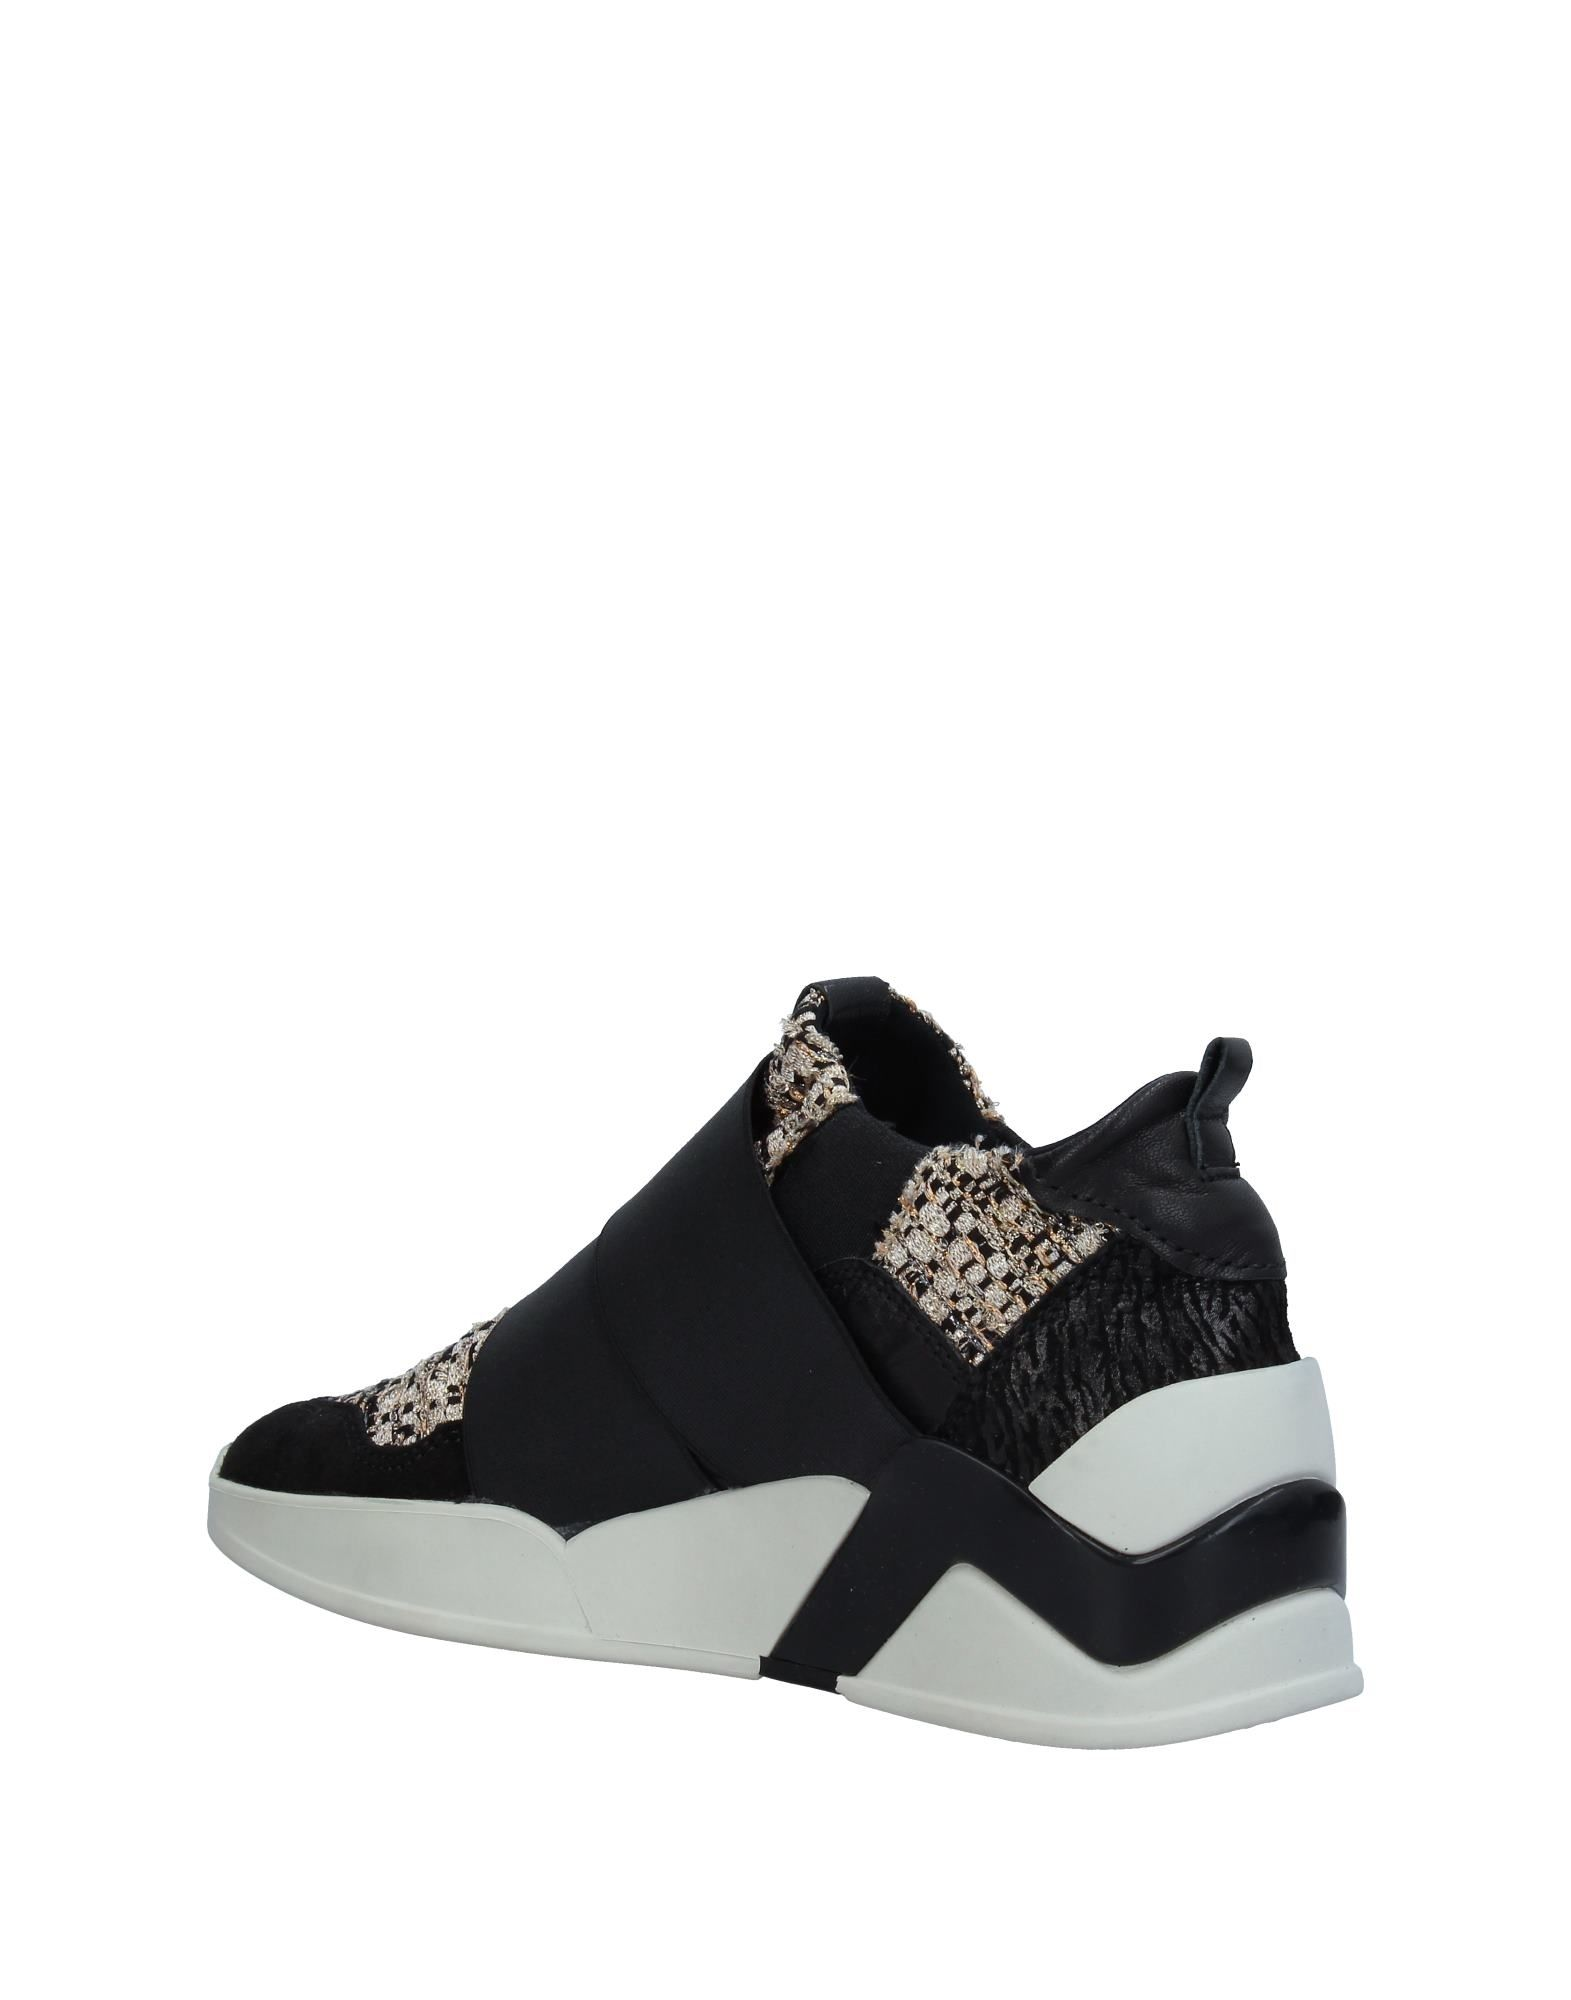 Sneakers Serafini Femme - Sneakers Serafini sur